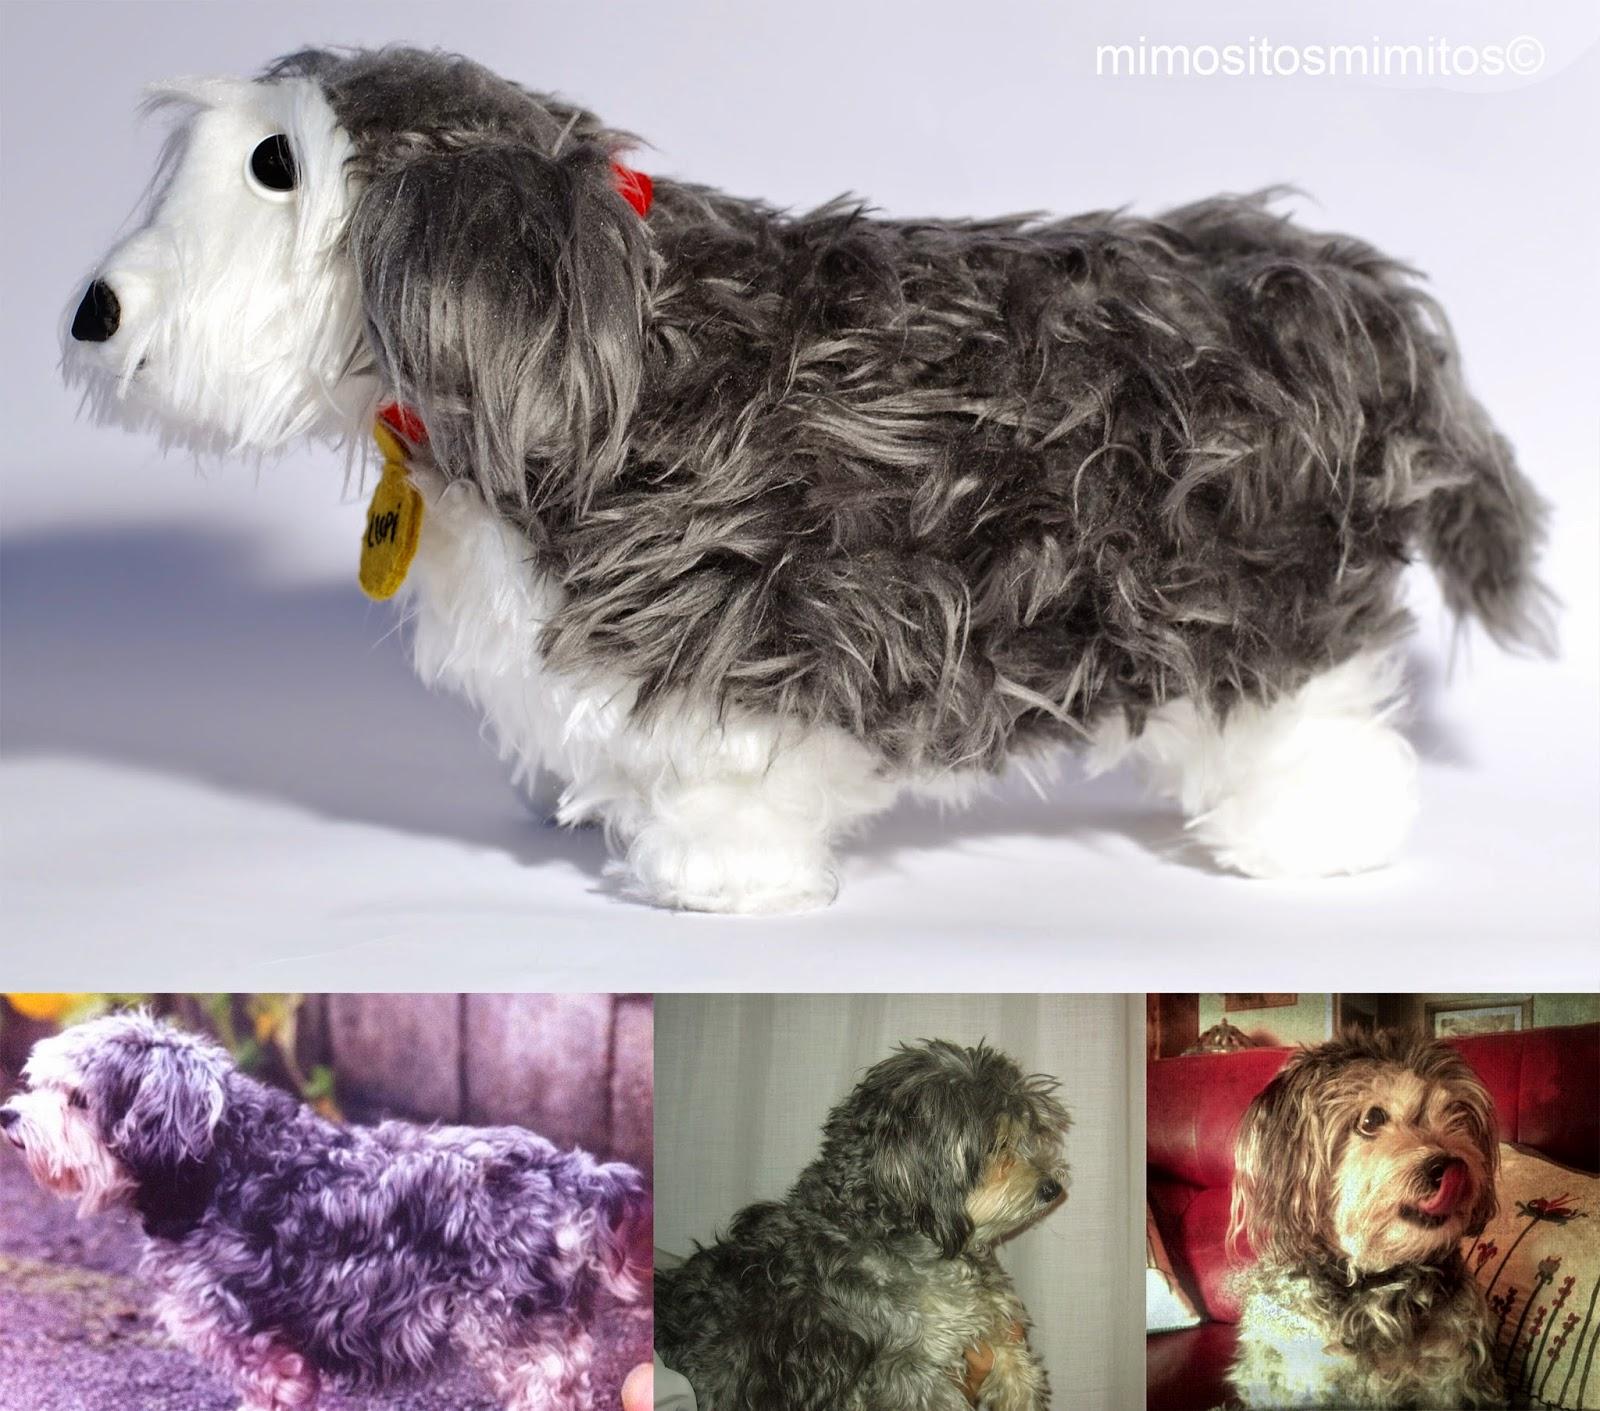 terrier beagle muñeco personalizado customized stuffed toy mascota  perro pelo dog